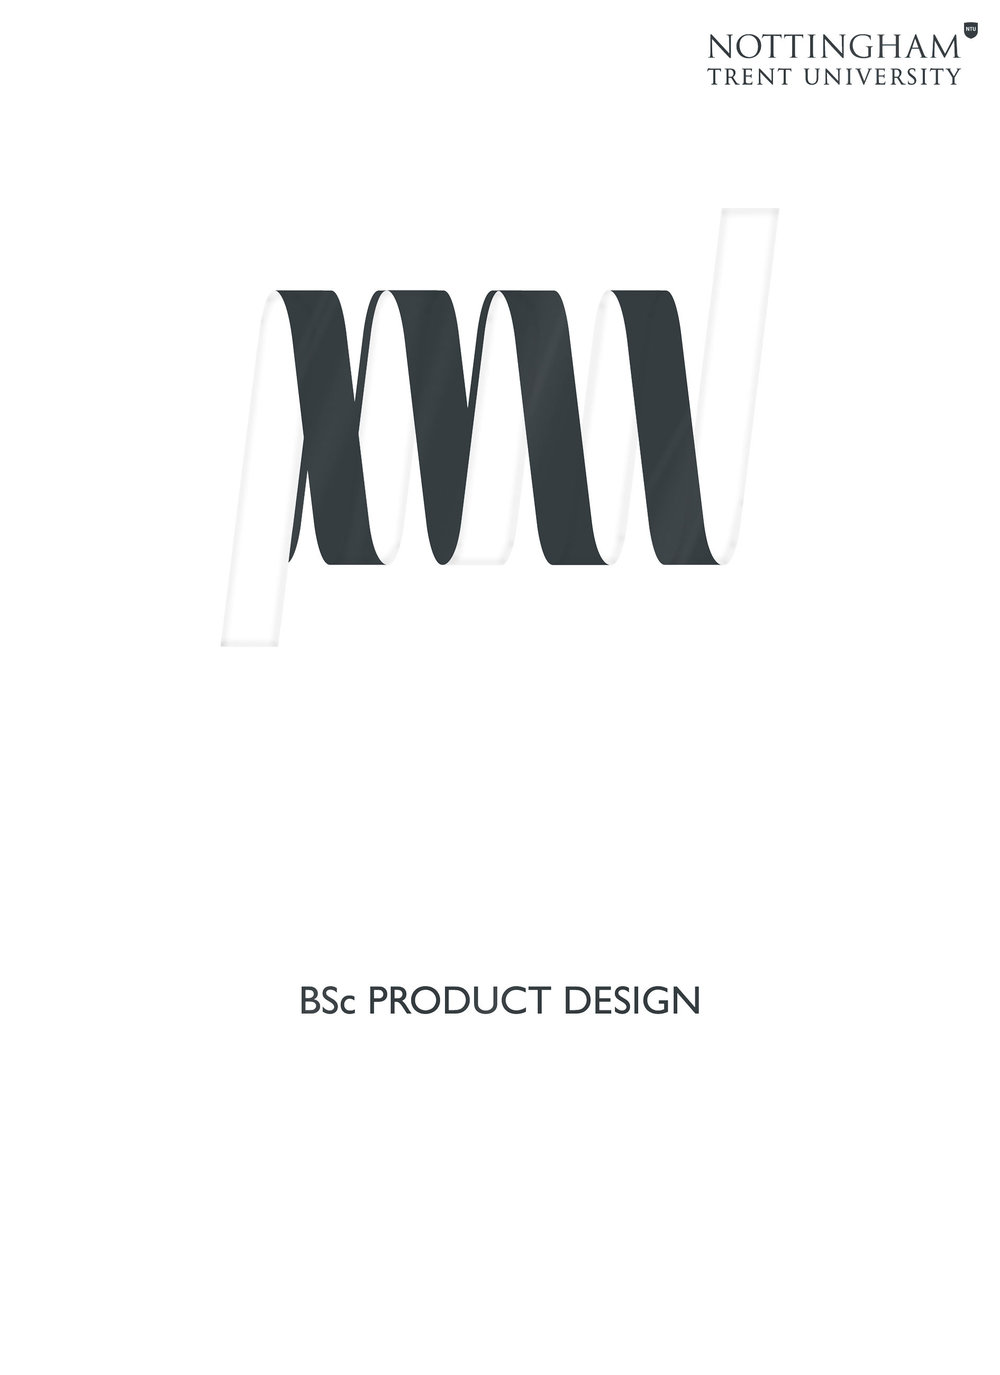 BSc Product Design - Brochure - NTU Degree Show 2017-1.jpg